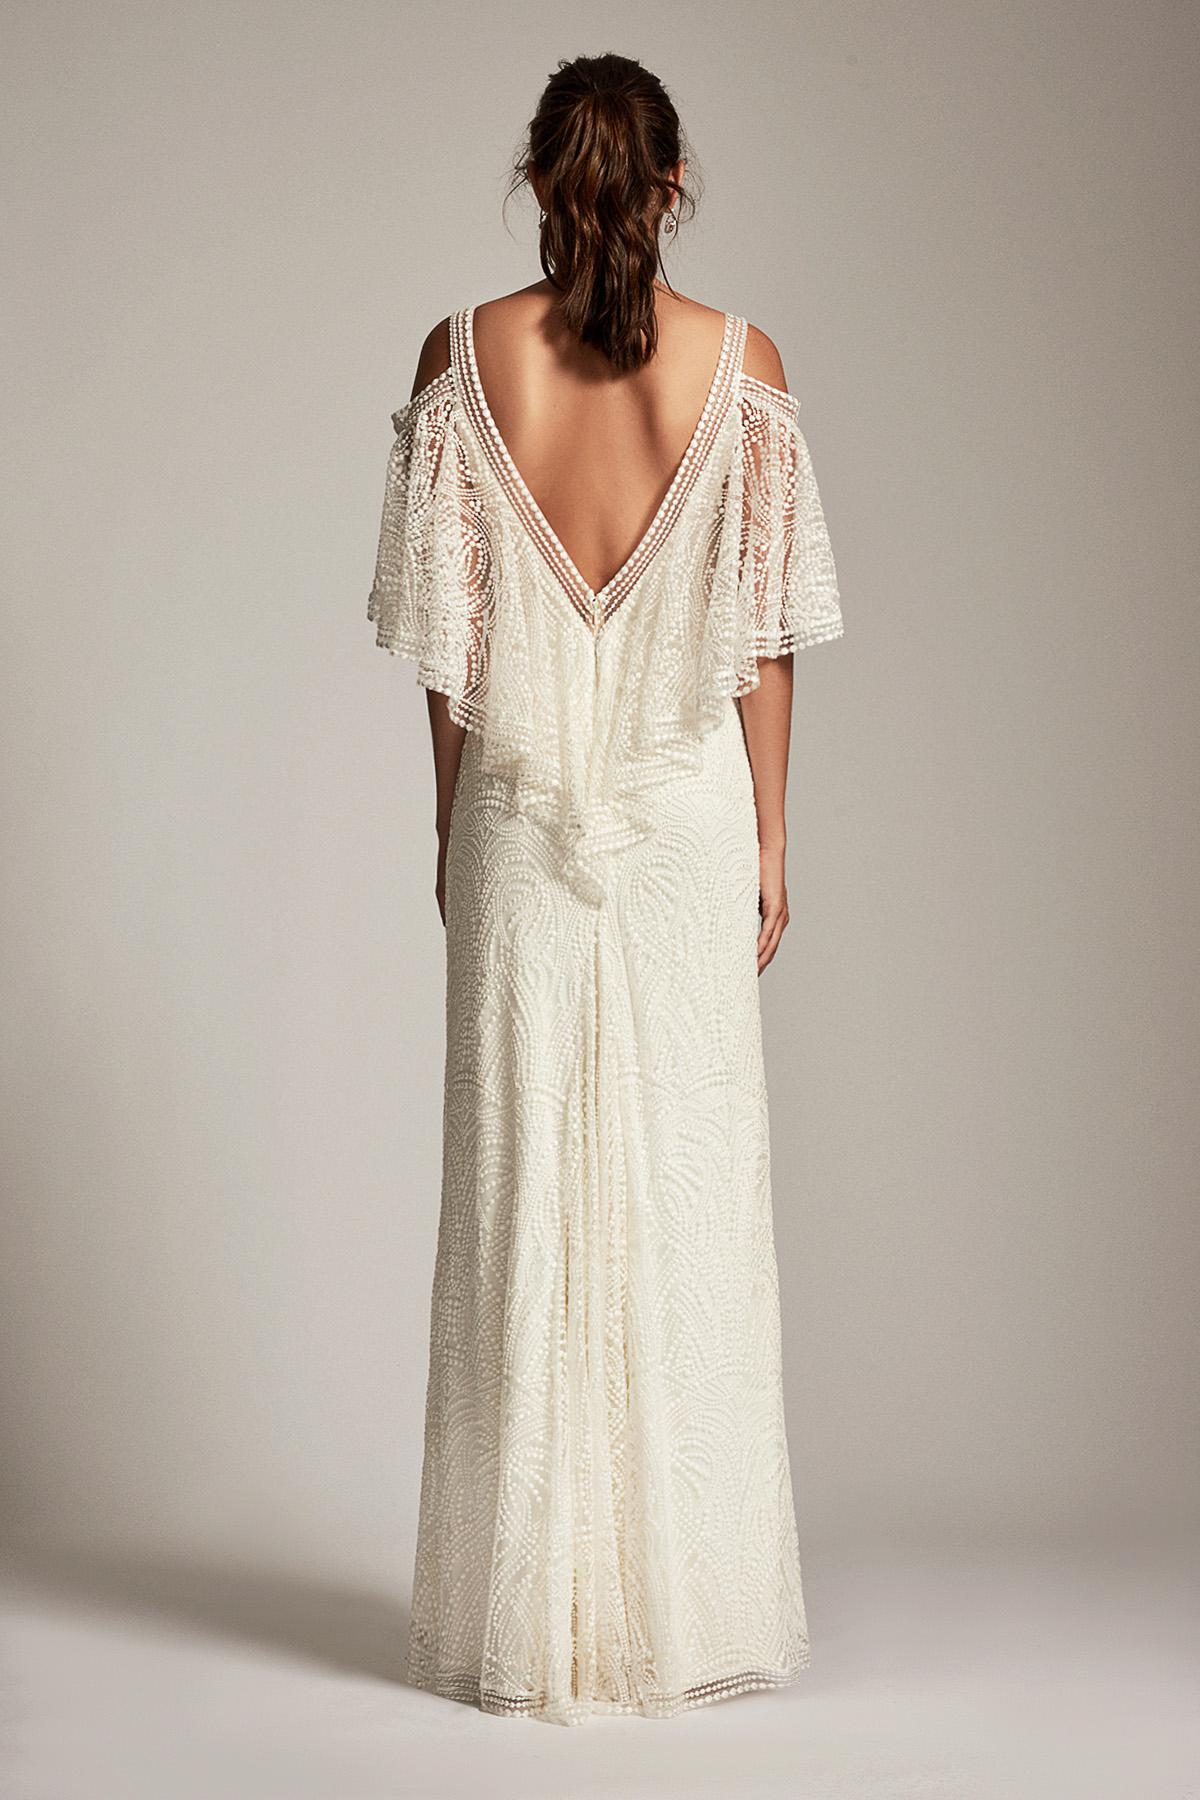 Lyst - Tadashi Shoji Adreanna Gown in White